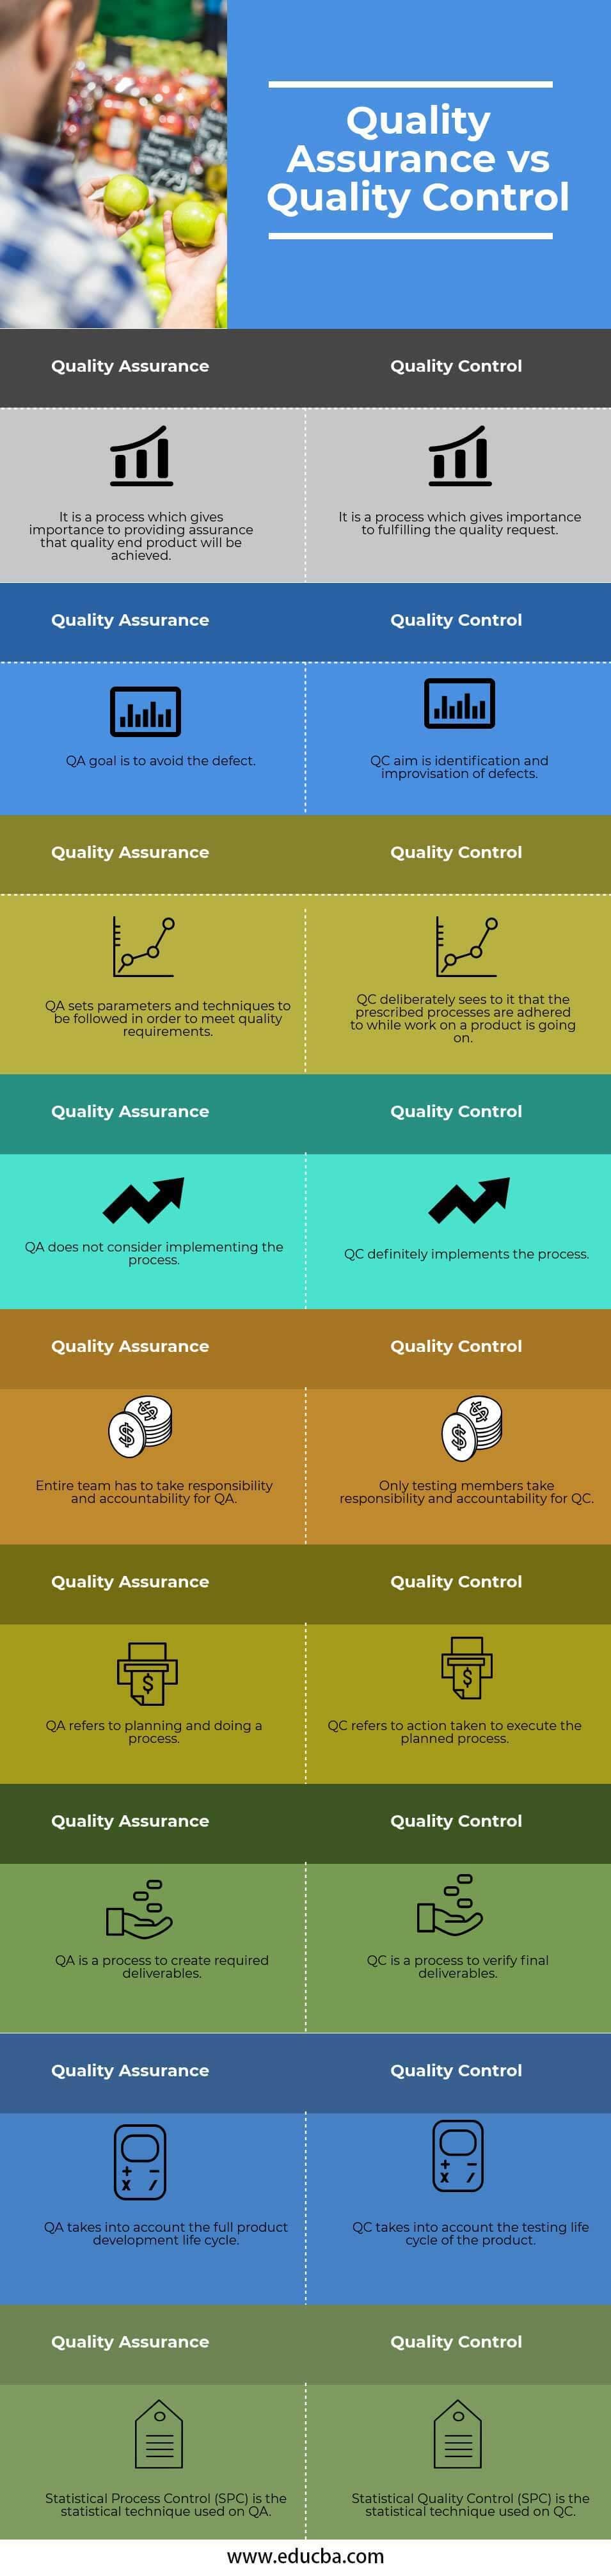 Quality Assurance vs Quality Control info